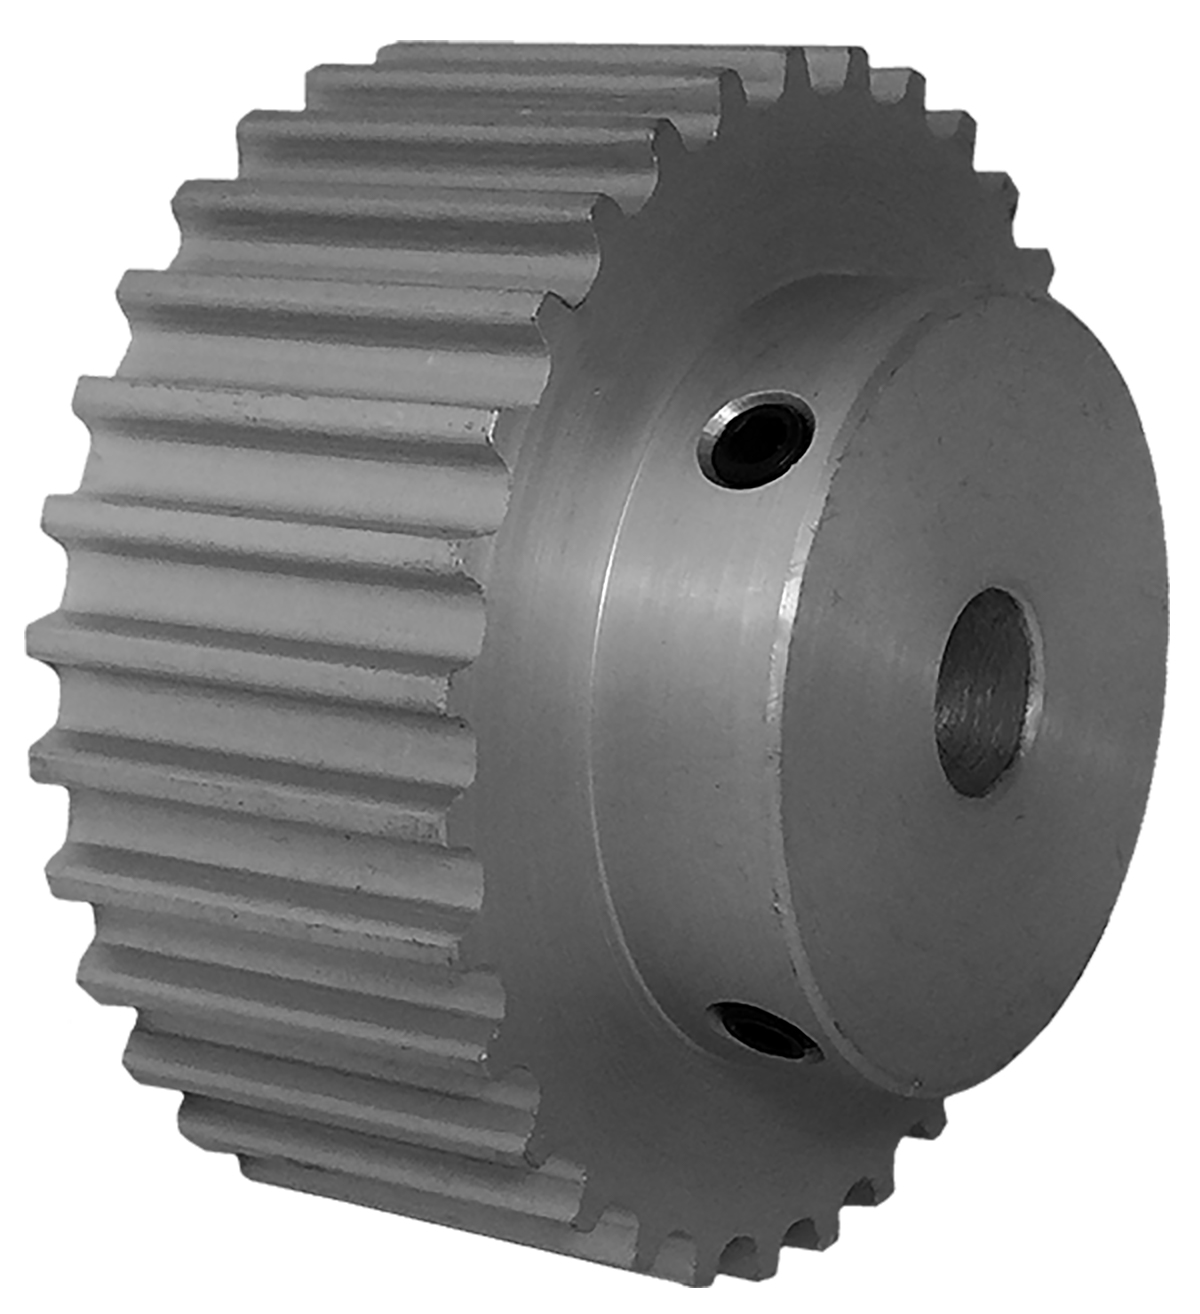 32-5M15M6A8 - Aluminum Powerhouse®HTD® Pulleys